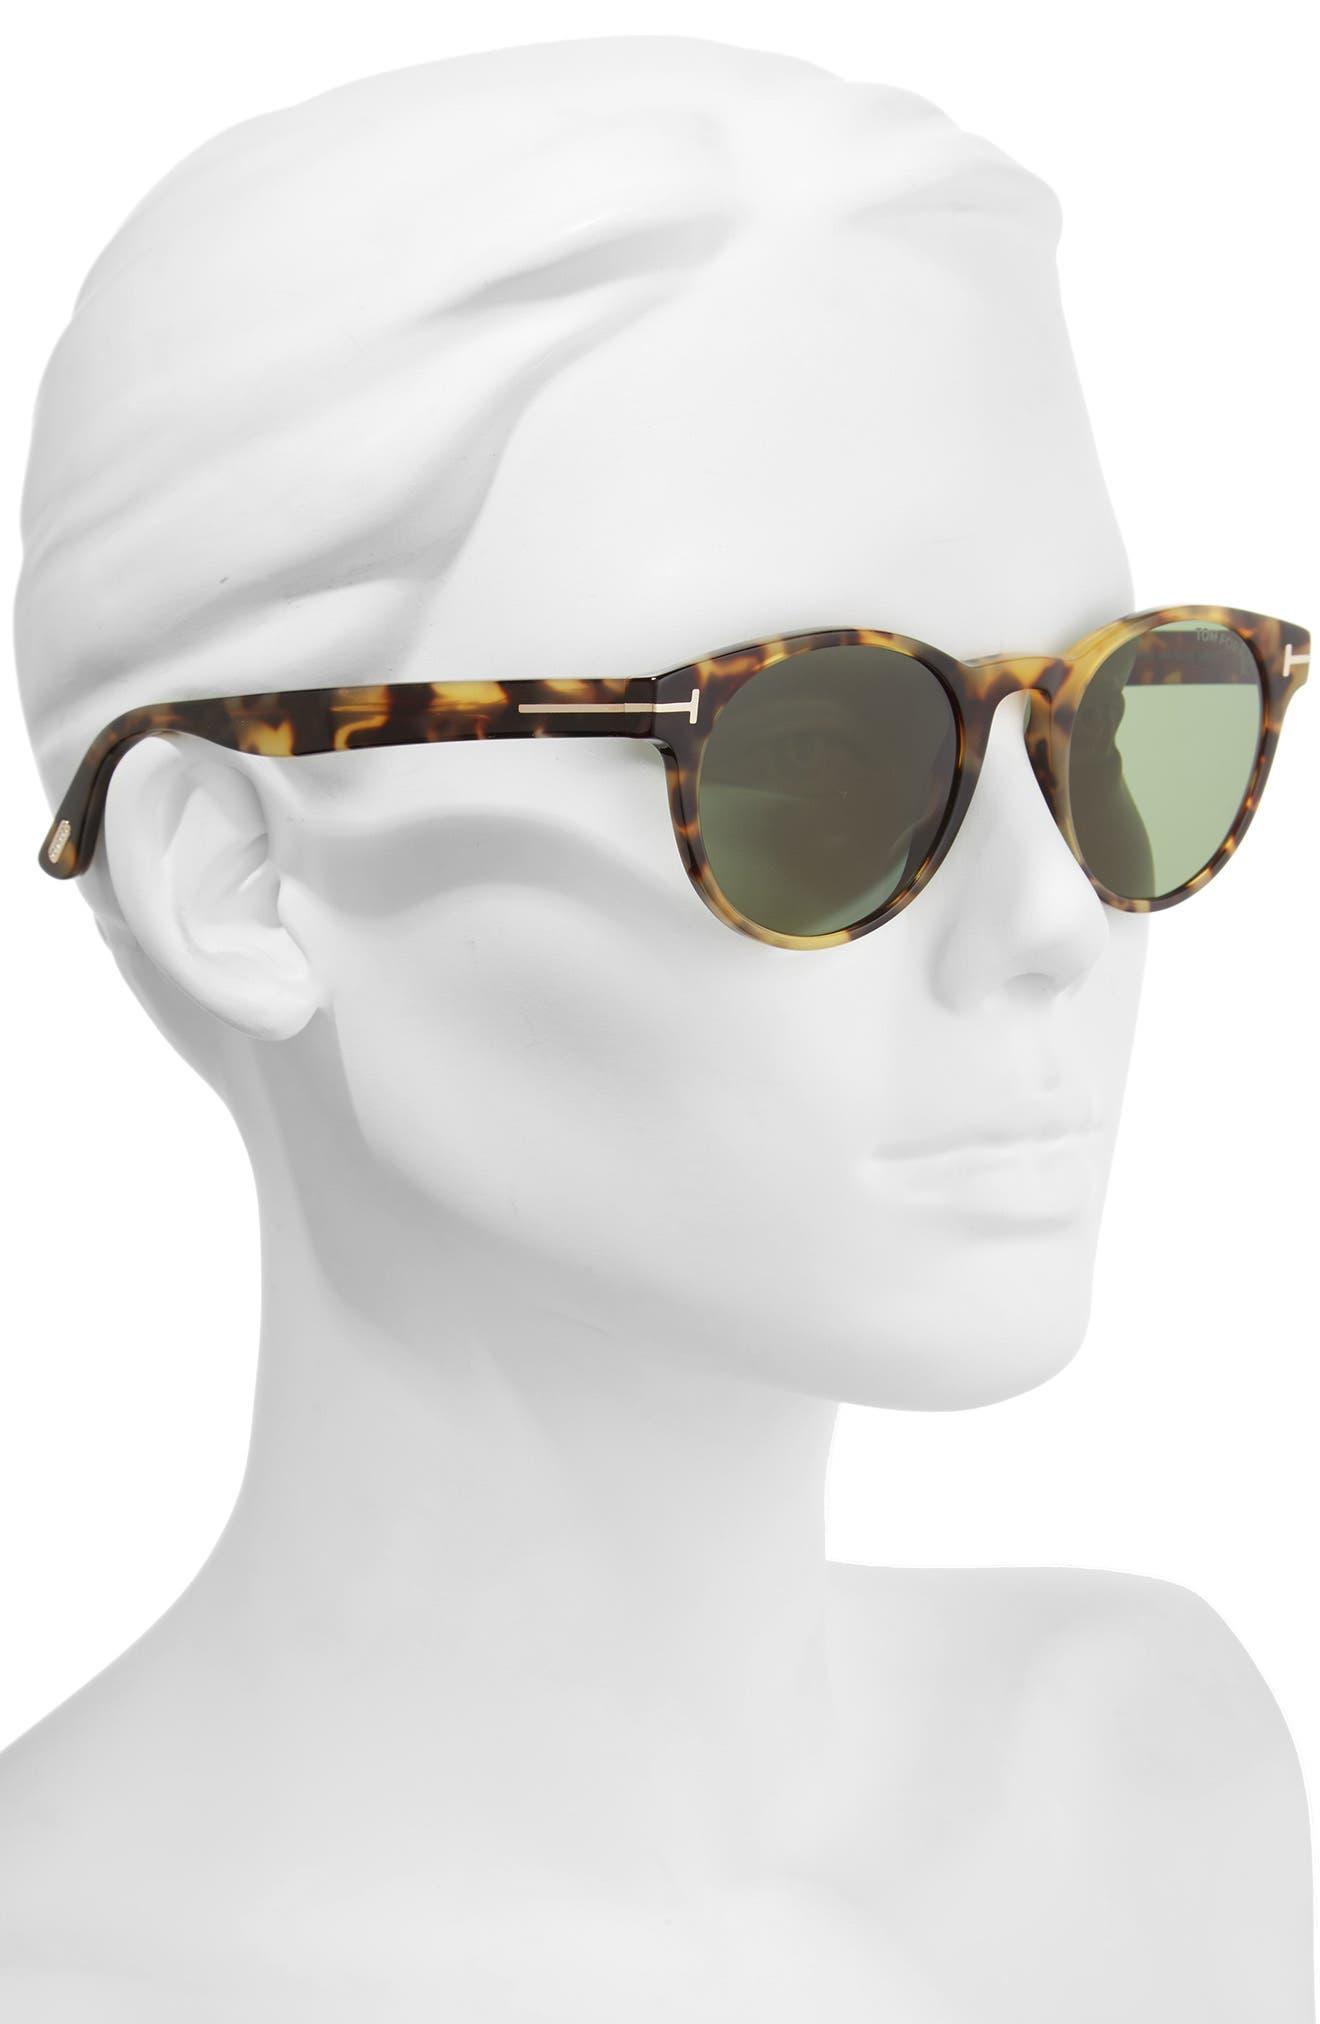 Alternate Image 2  - Tom Ford Palmer 51mm Gradient Lens Sunglasses